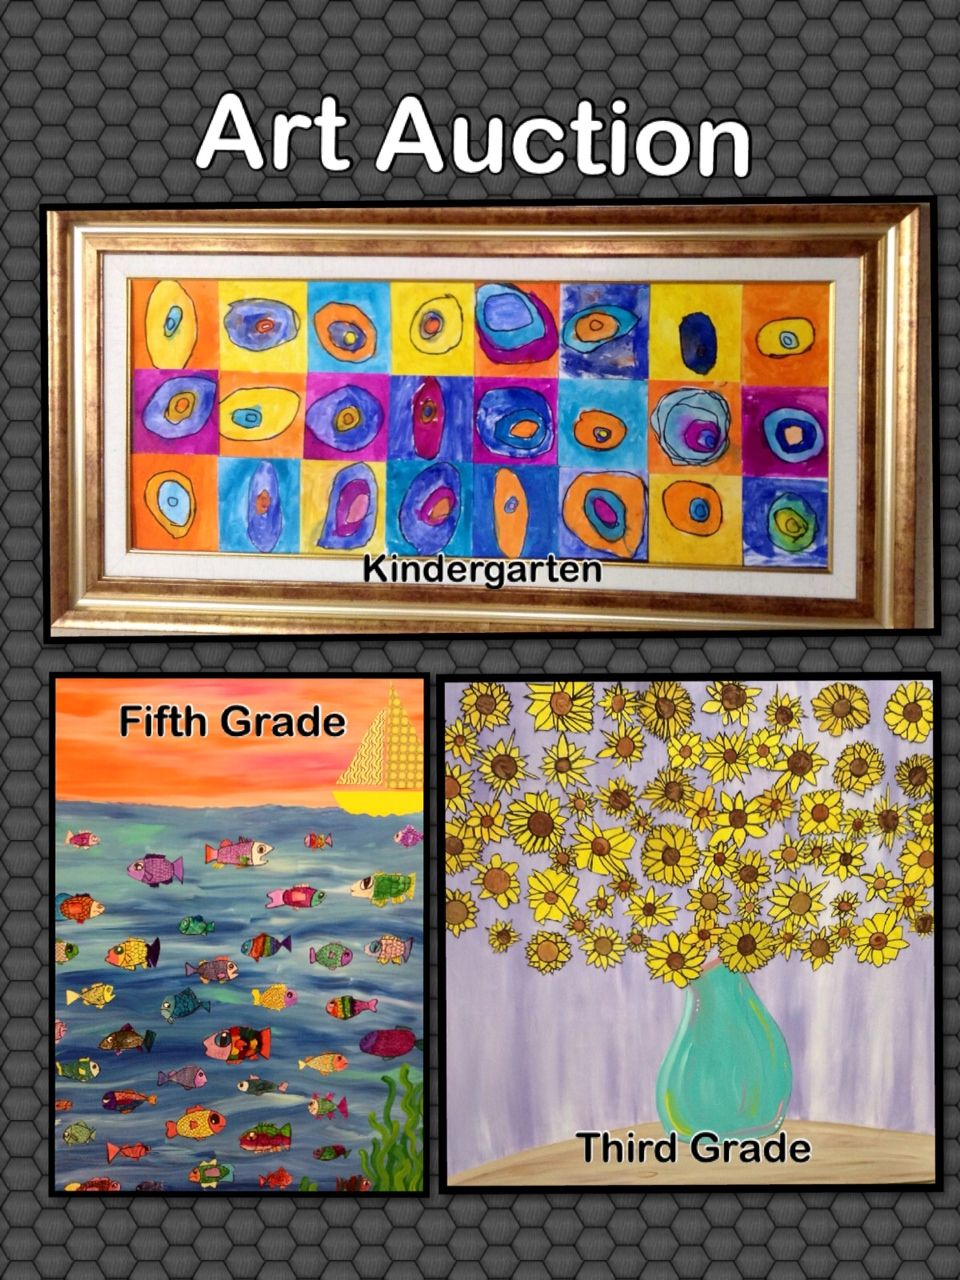 Art Auction Children' Auctions And Crafts School